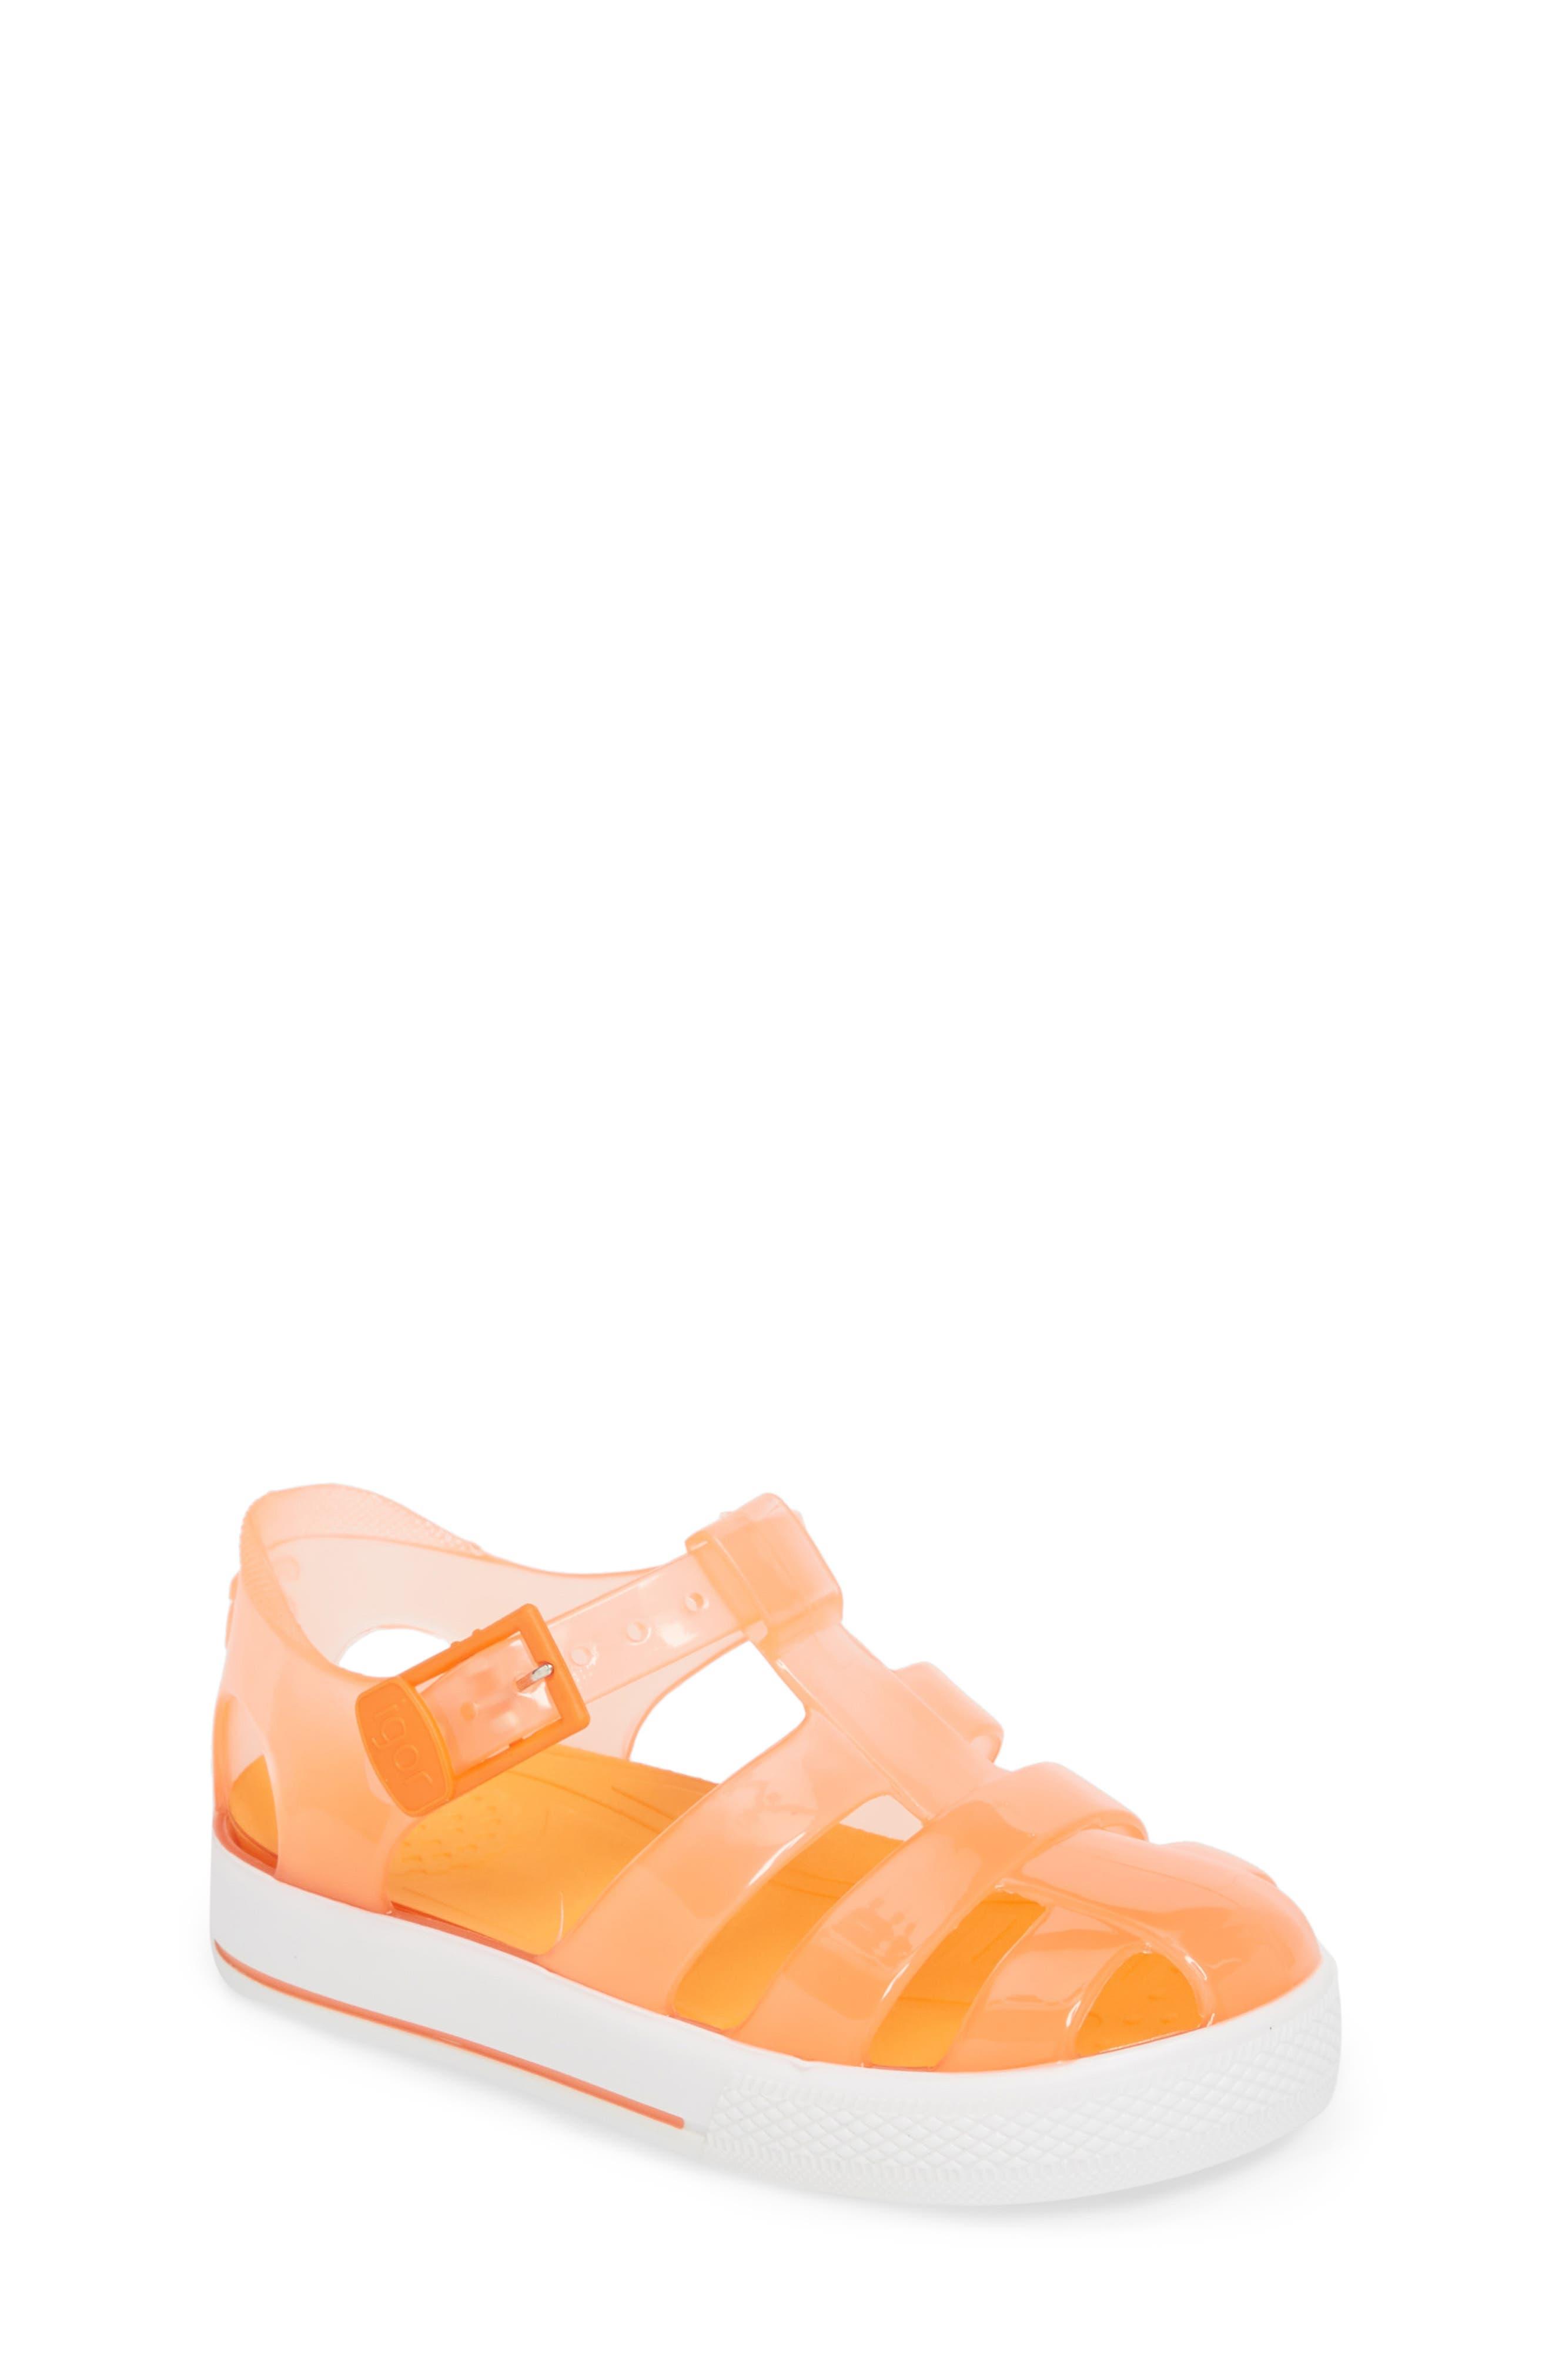 Tenis Fisherman Jelly Sandal,                         Main,                         color, Crystal Neon Orange